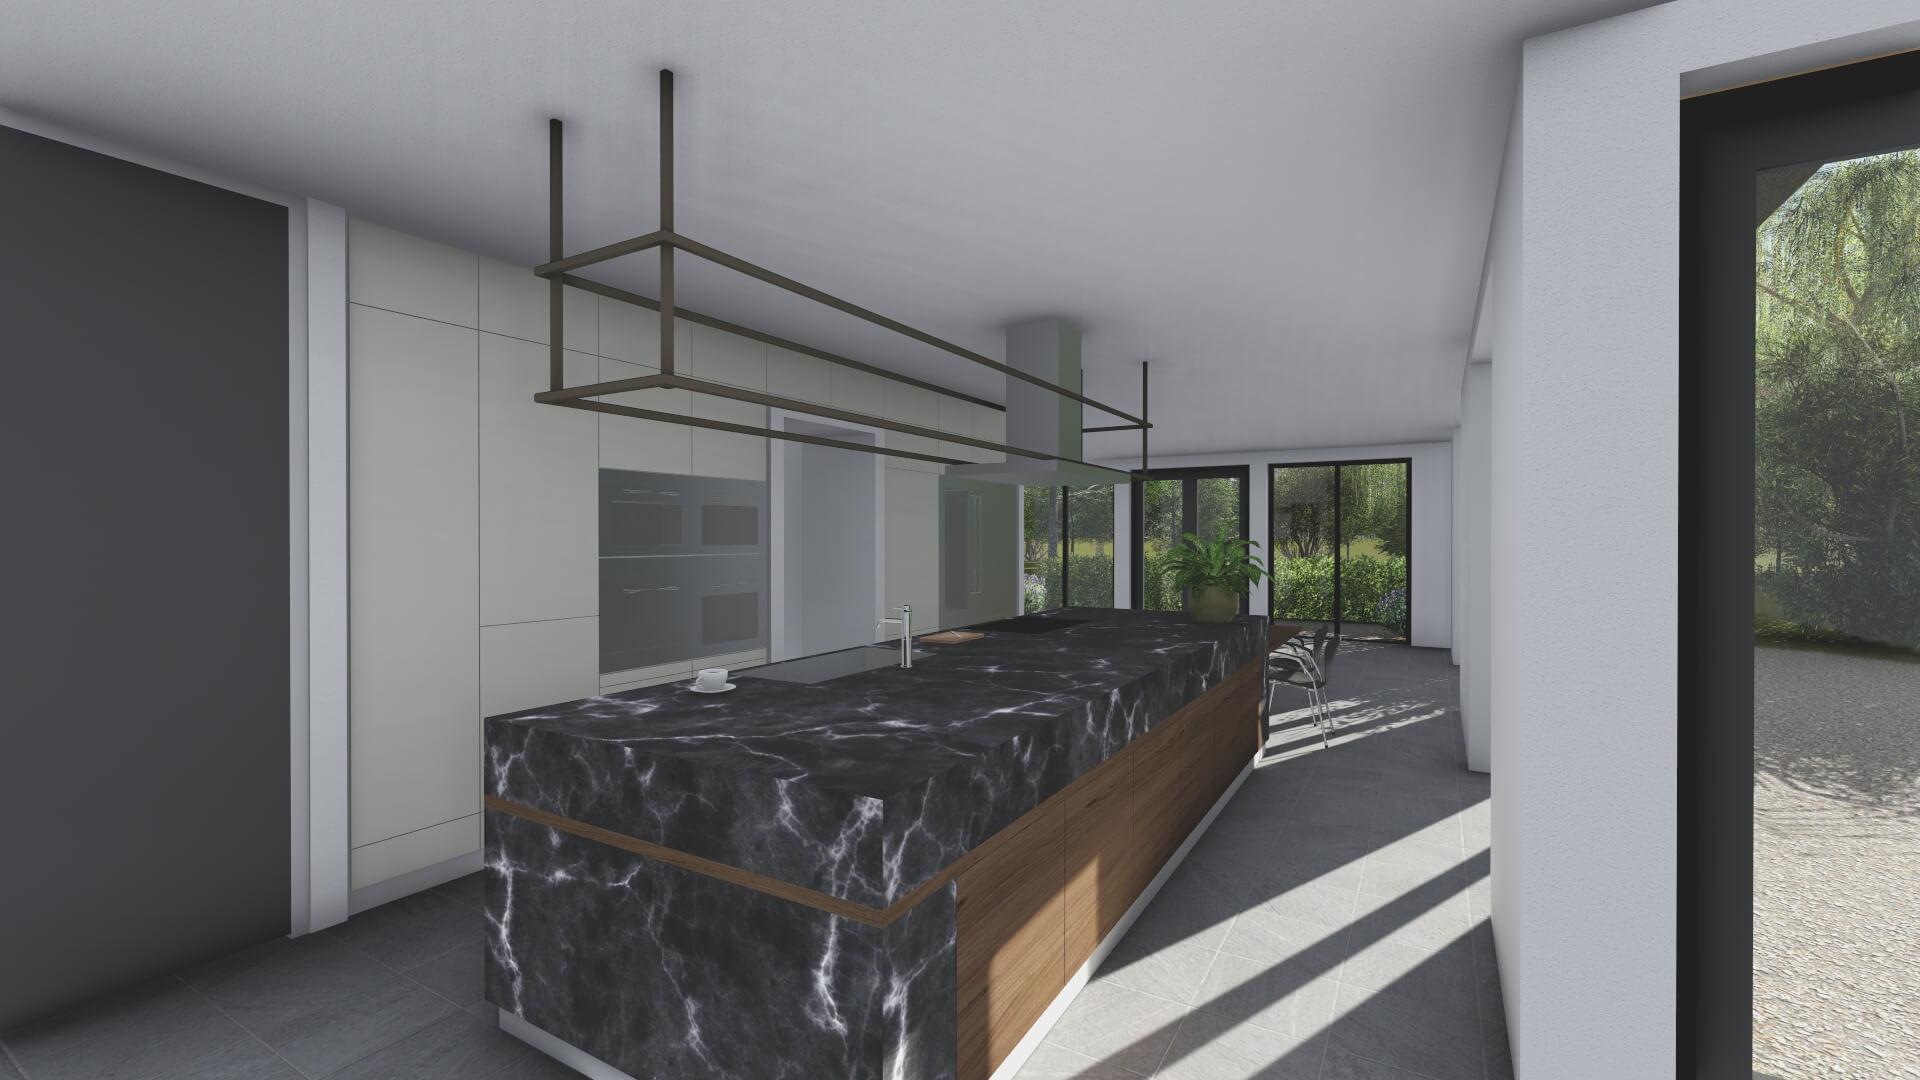 Interieur keuken | Wijnja Groep B.V.